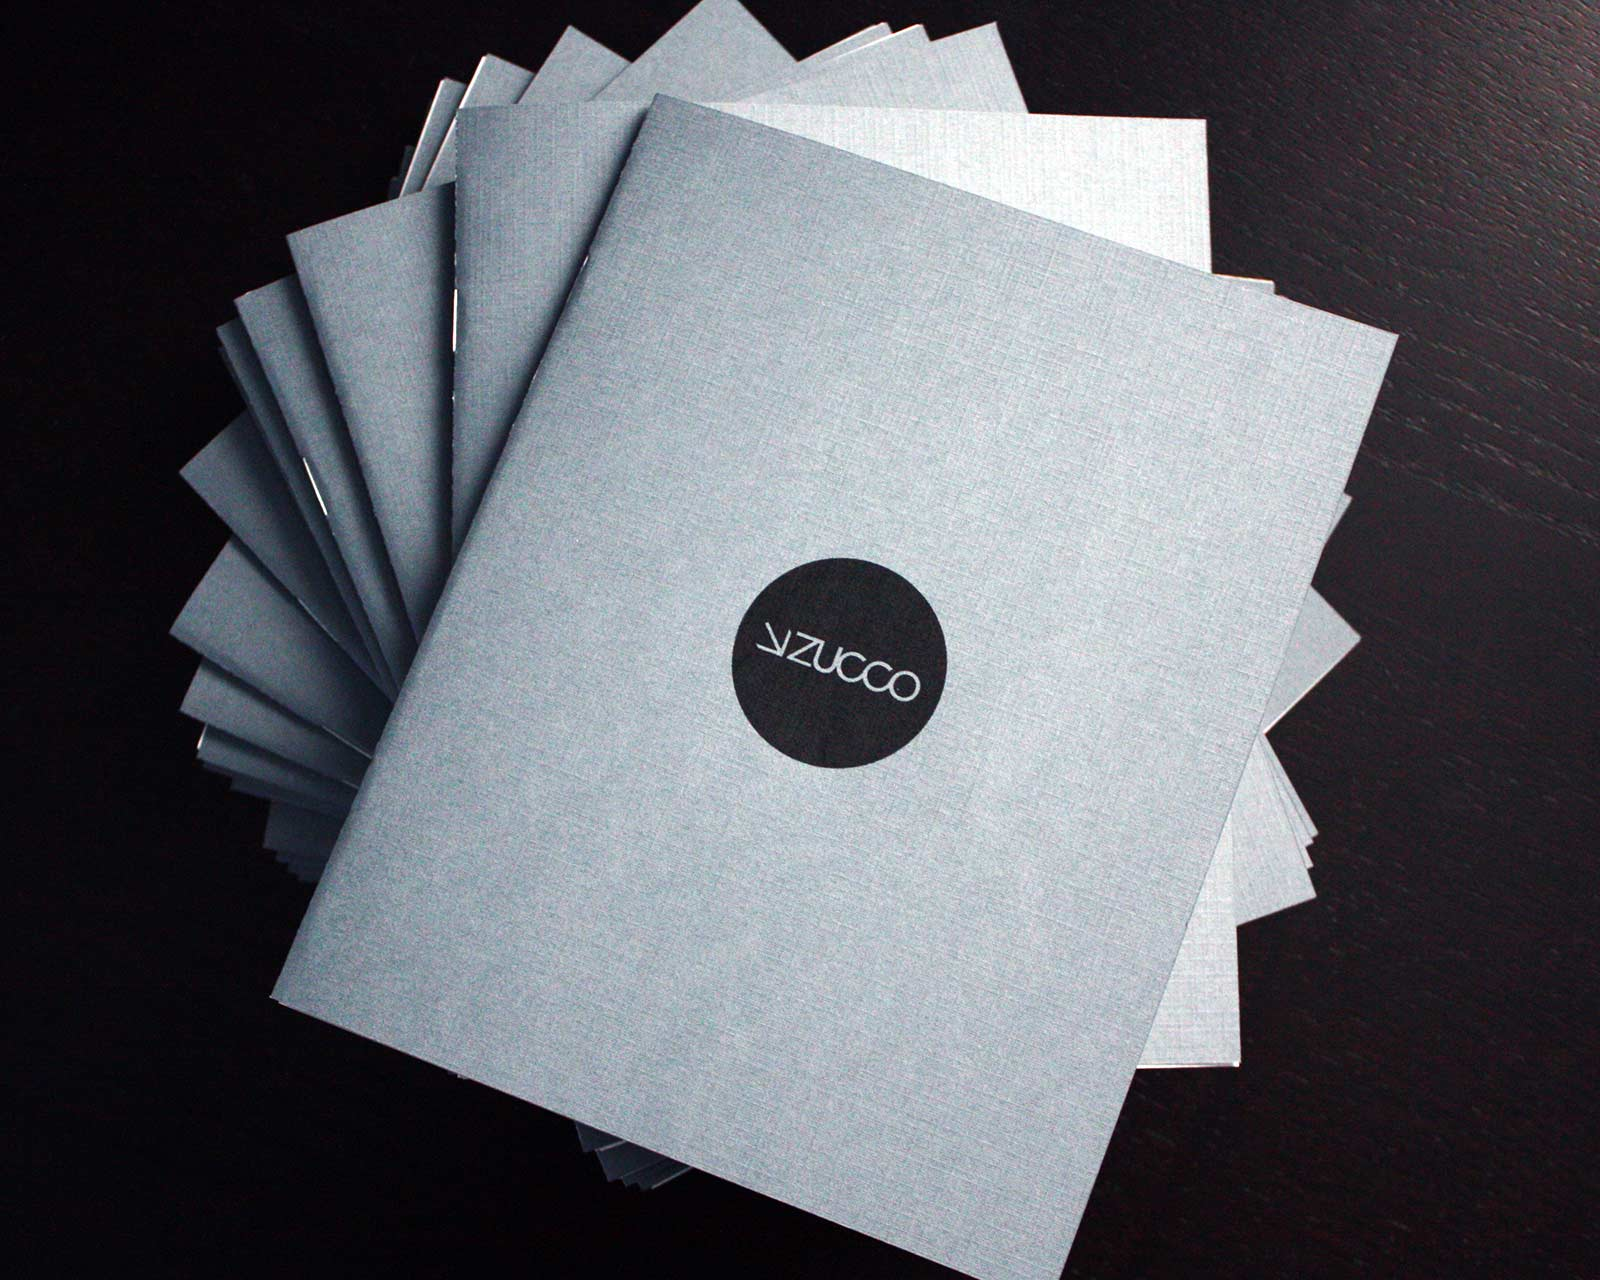 justin-zucco-self-promo-book-1.jpg